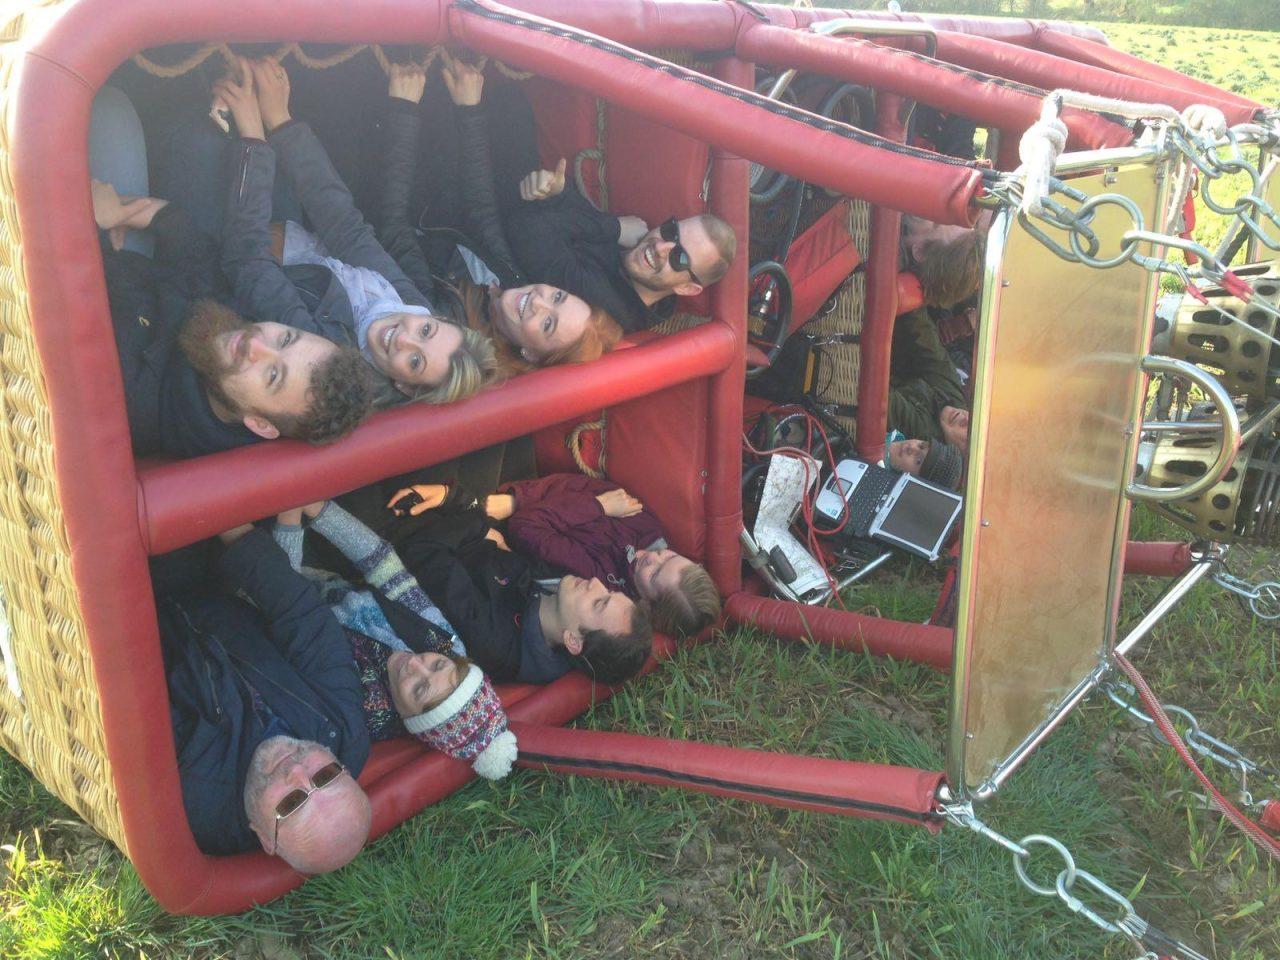 Passengers in a hot air balloon basket drag landing